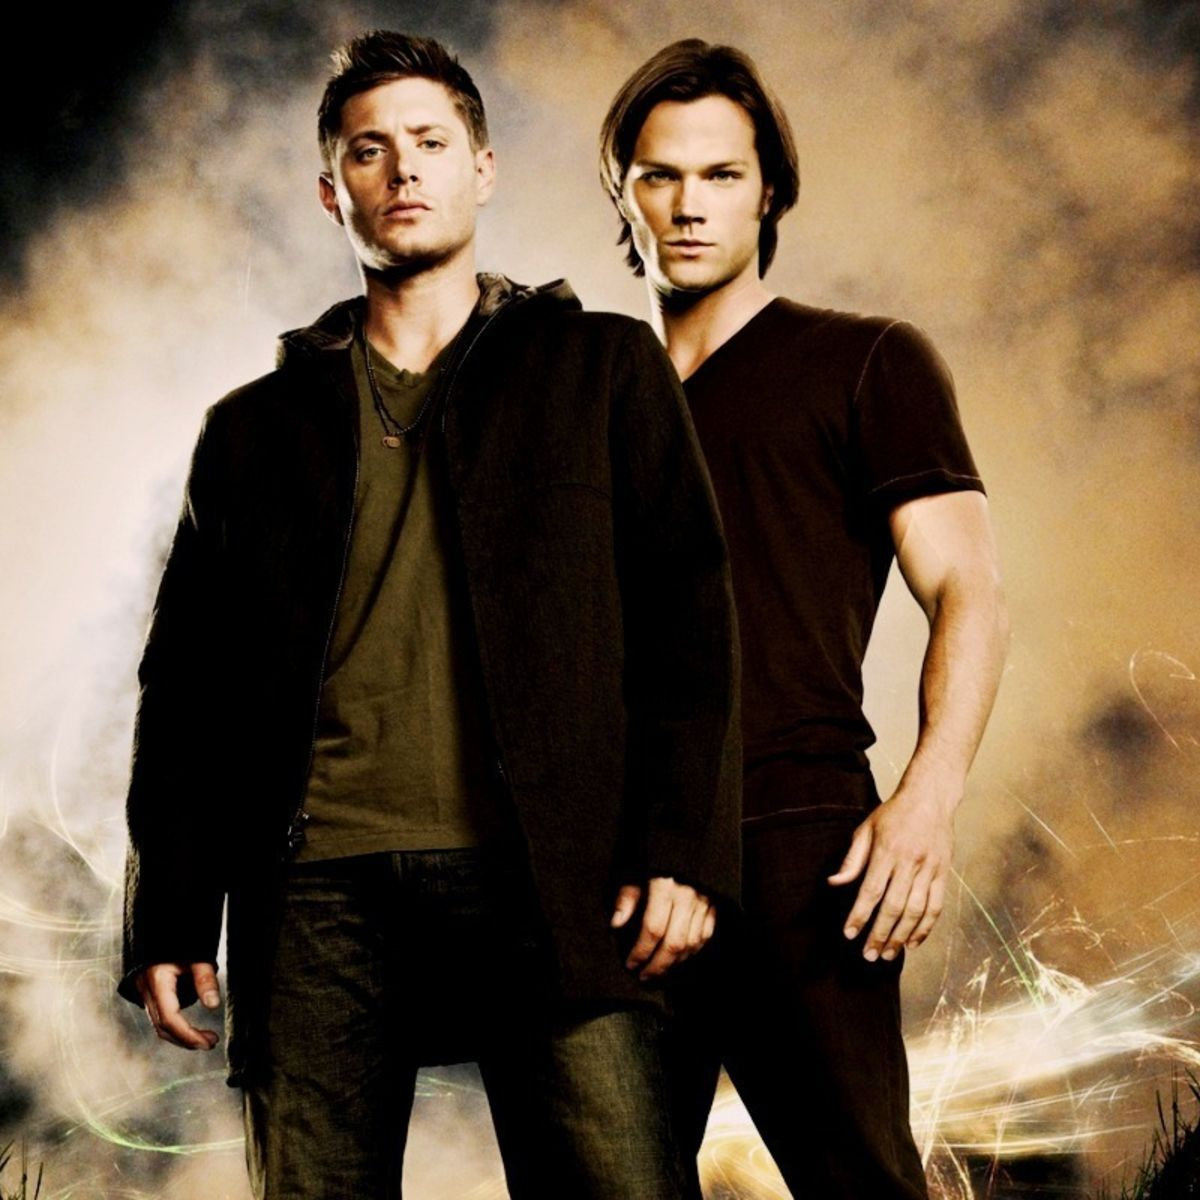 Sam-Dean-supernatural-16744488-1280-800.jpg